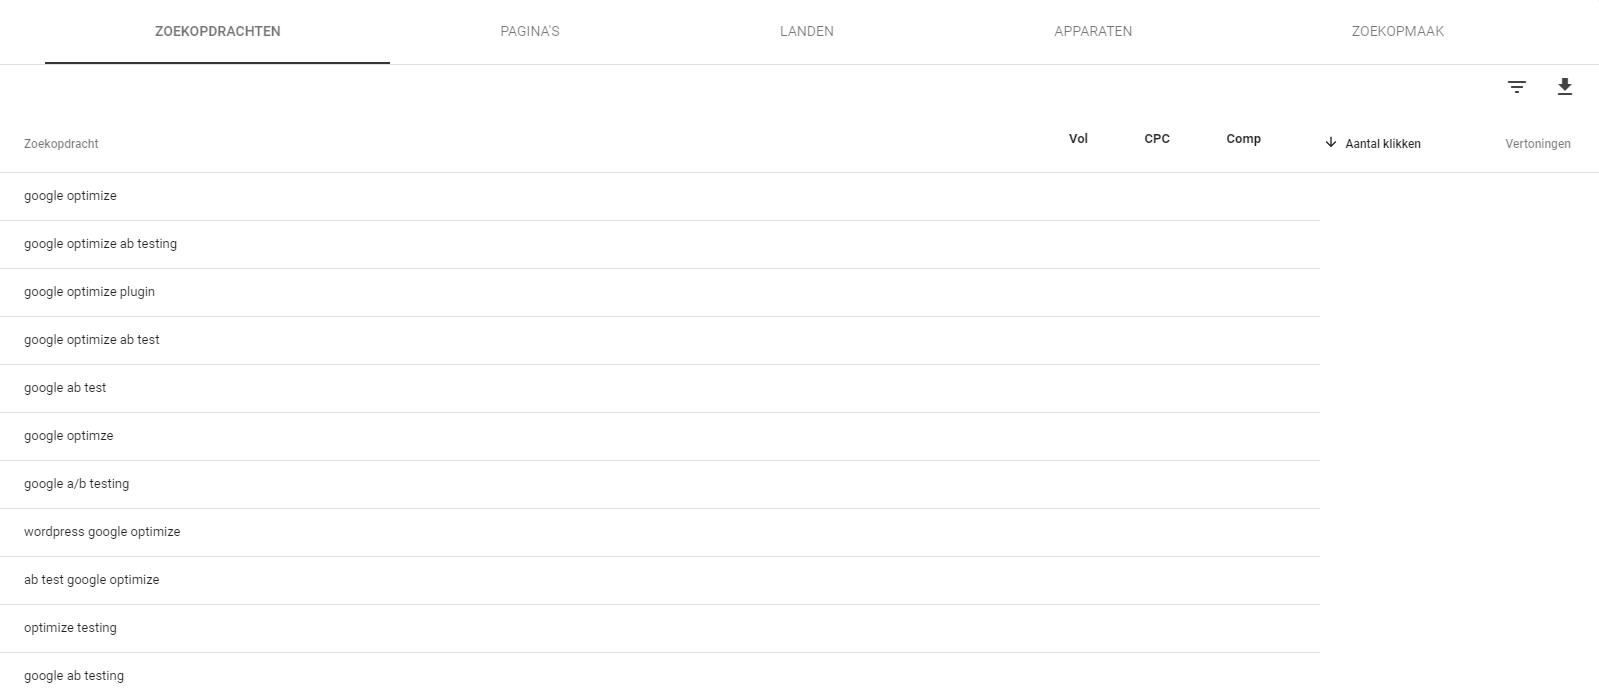 Zoekopdrachten tabel Google Search Console